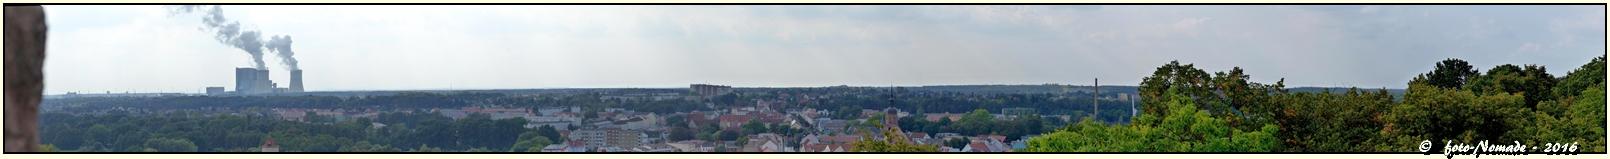 Blick vom Bismarck-Turm  ..